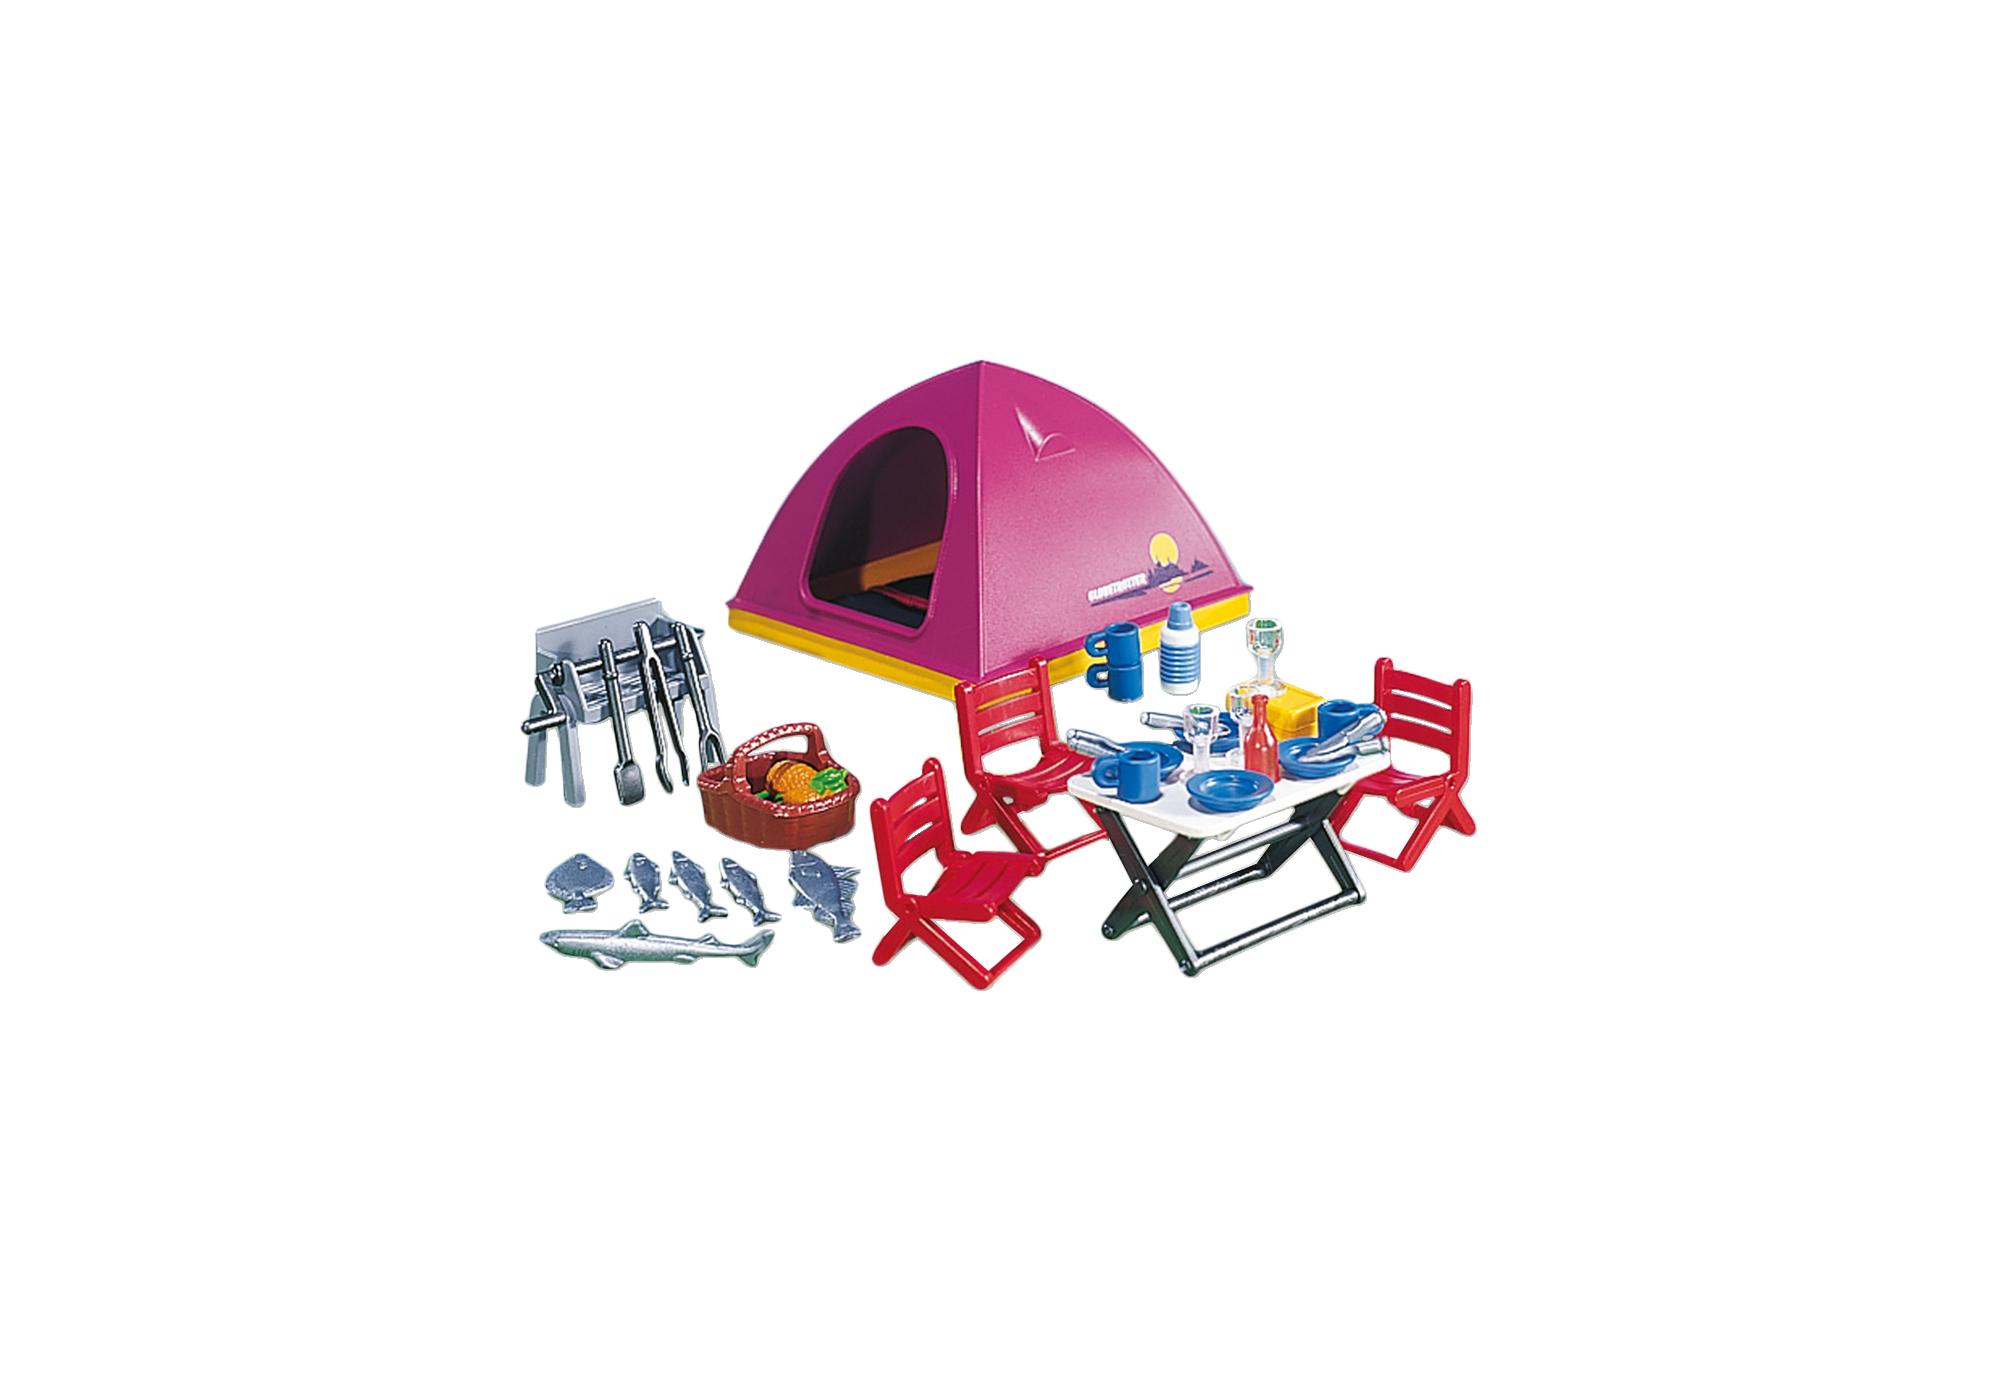 http://media.playmobil.com/i/playmobil/7260_product_detail/Camping Set